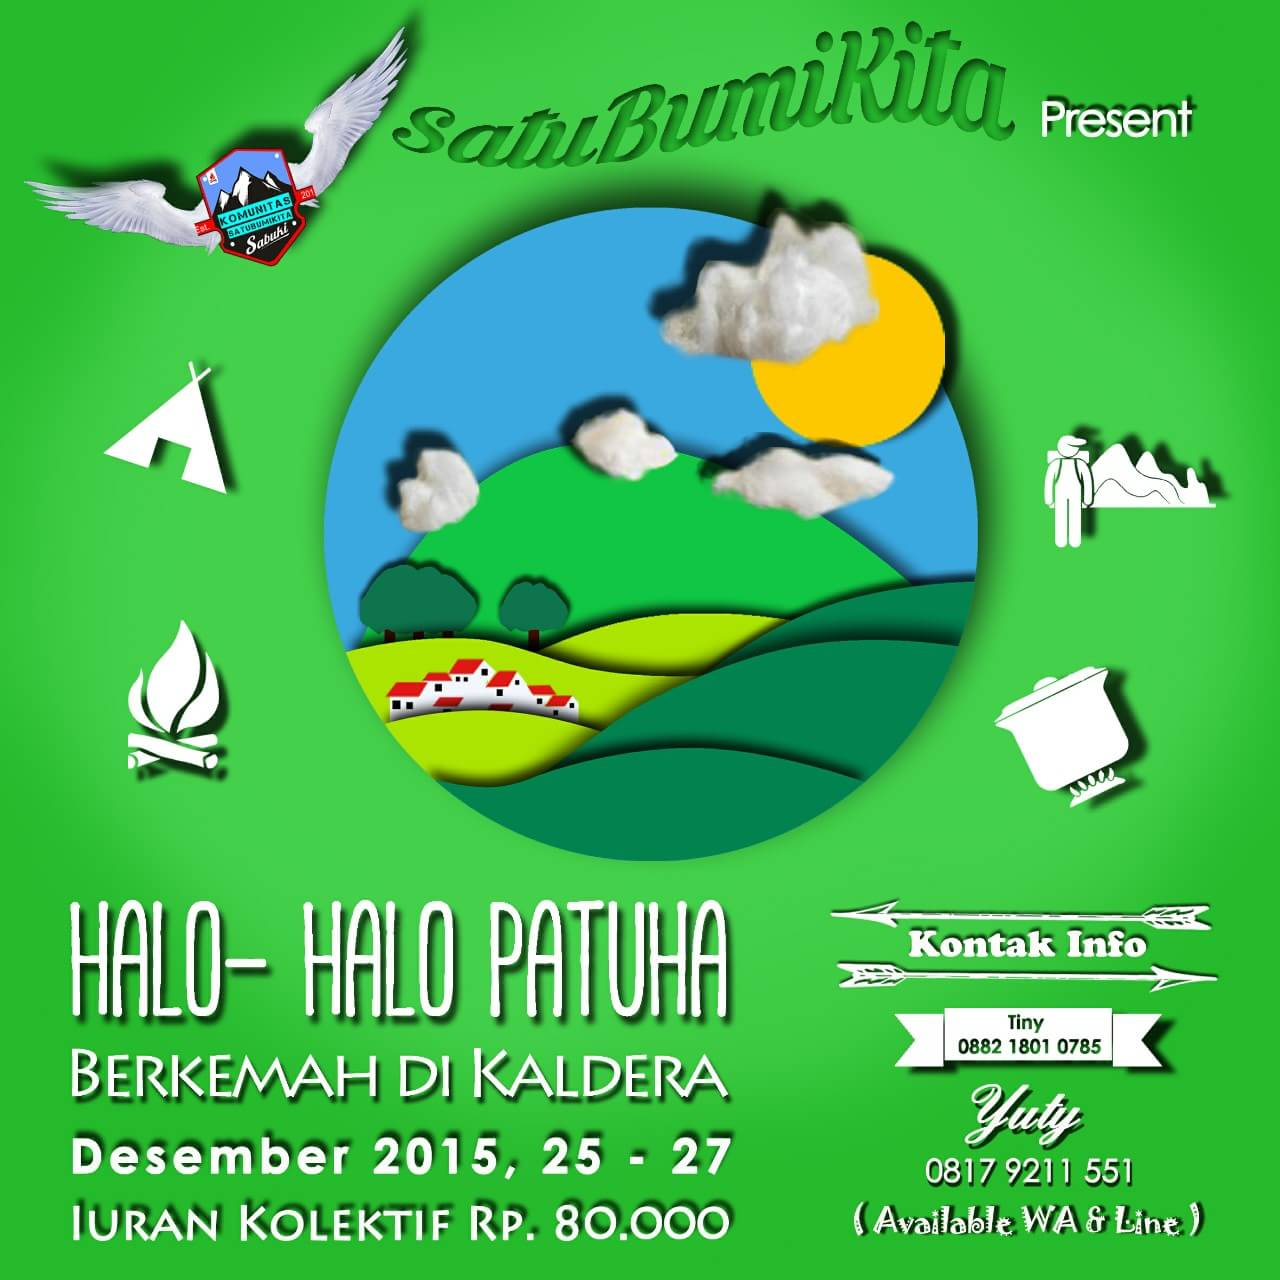 Halo-Halo Patuha, Berkemah Di Kaldera, 25-27 Desember 2015